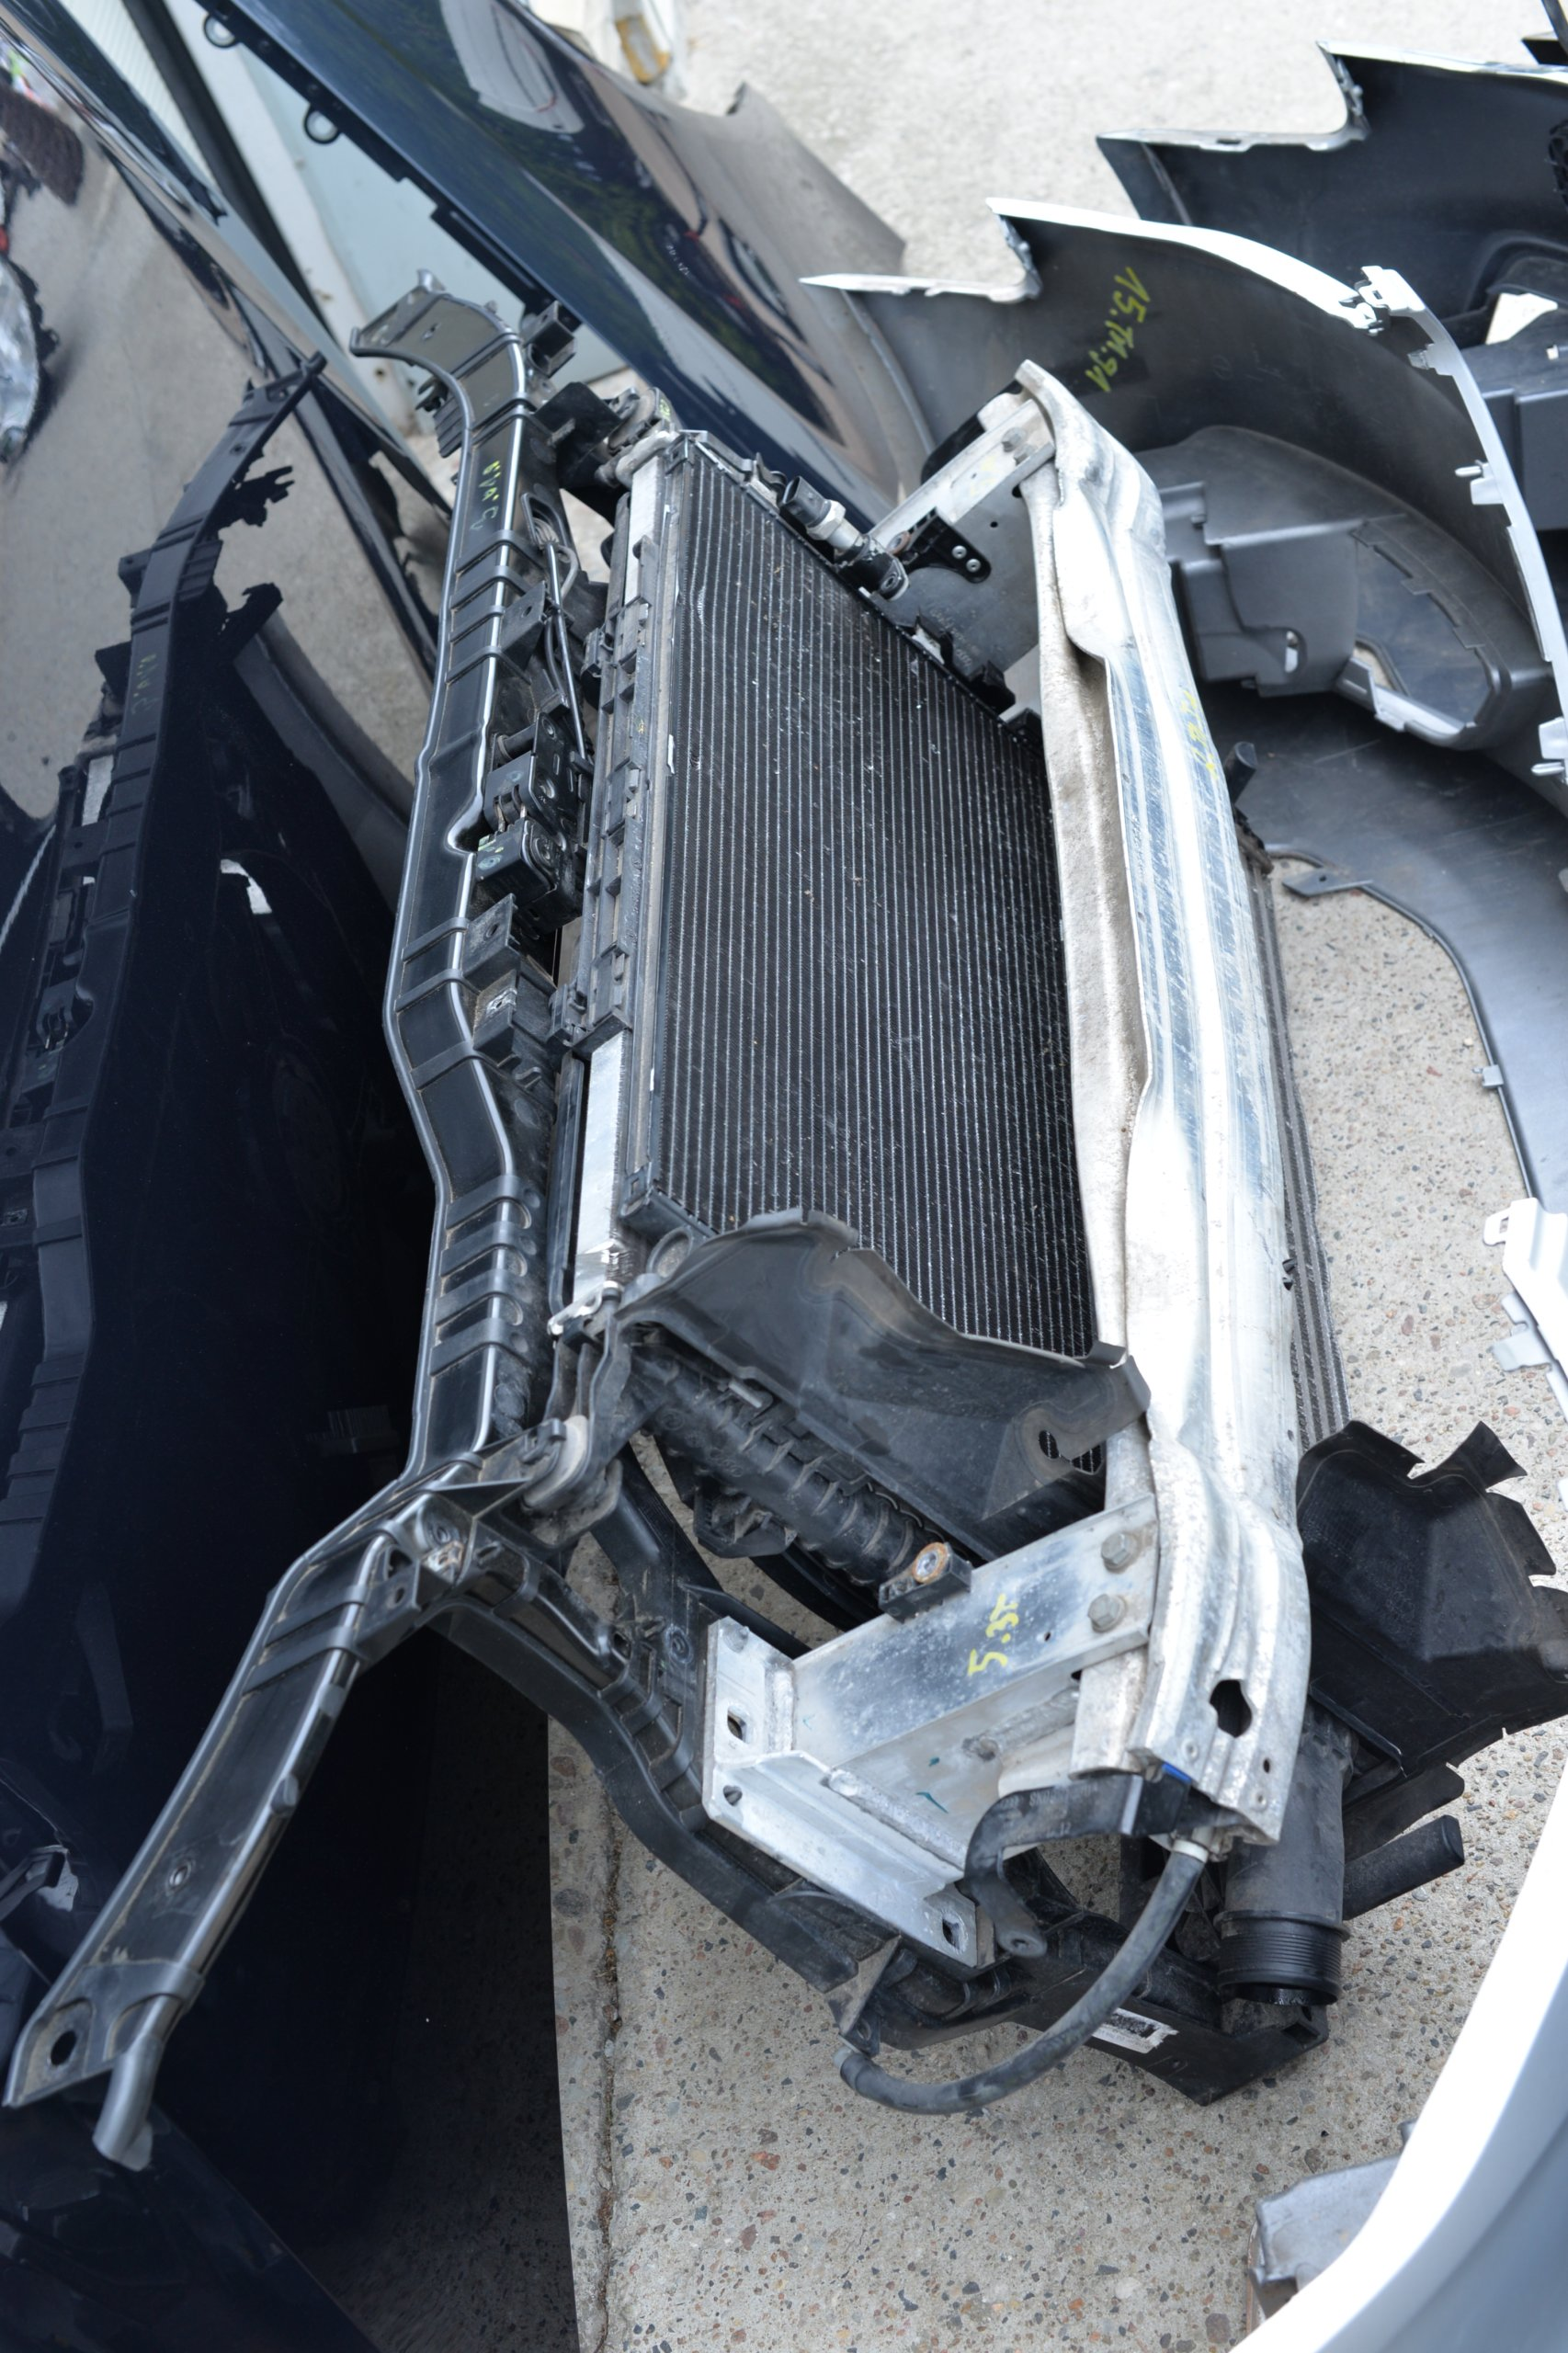 капот бампер крило фара пас audi a4 b8 2012-16, фото